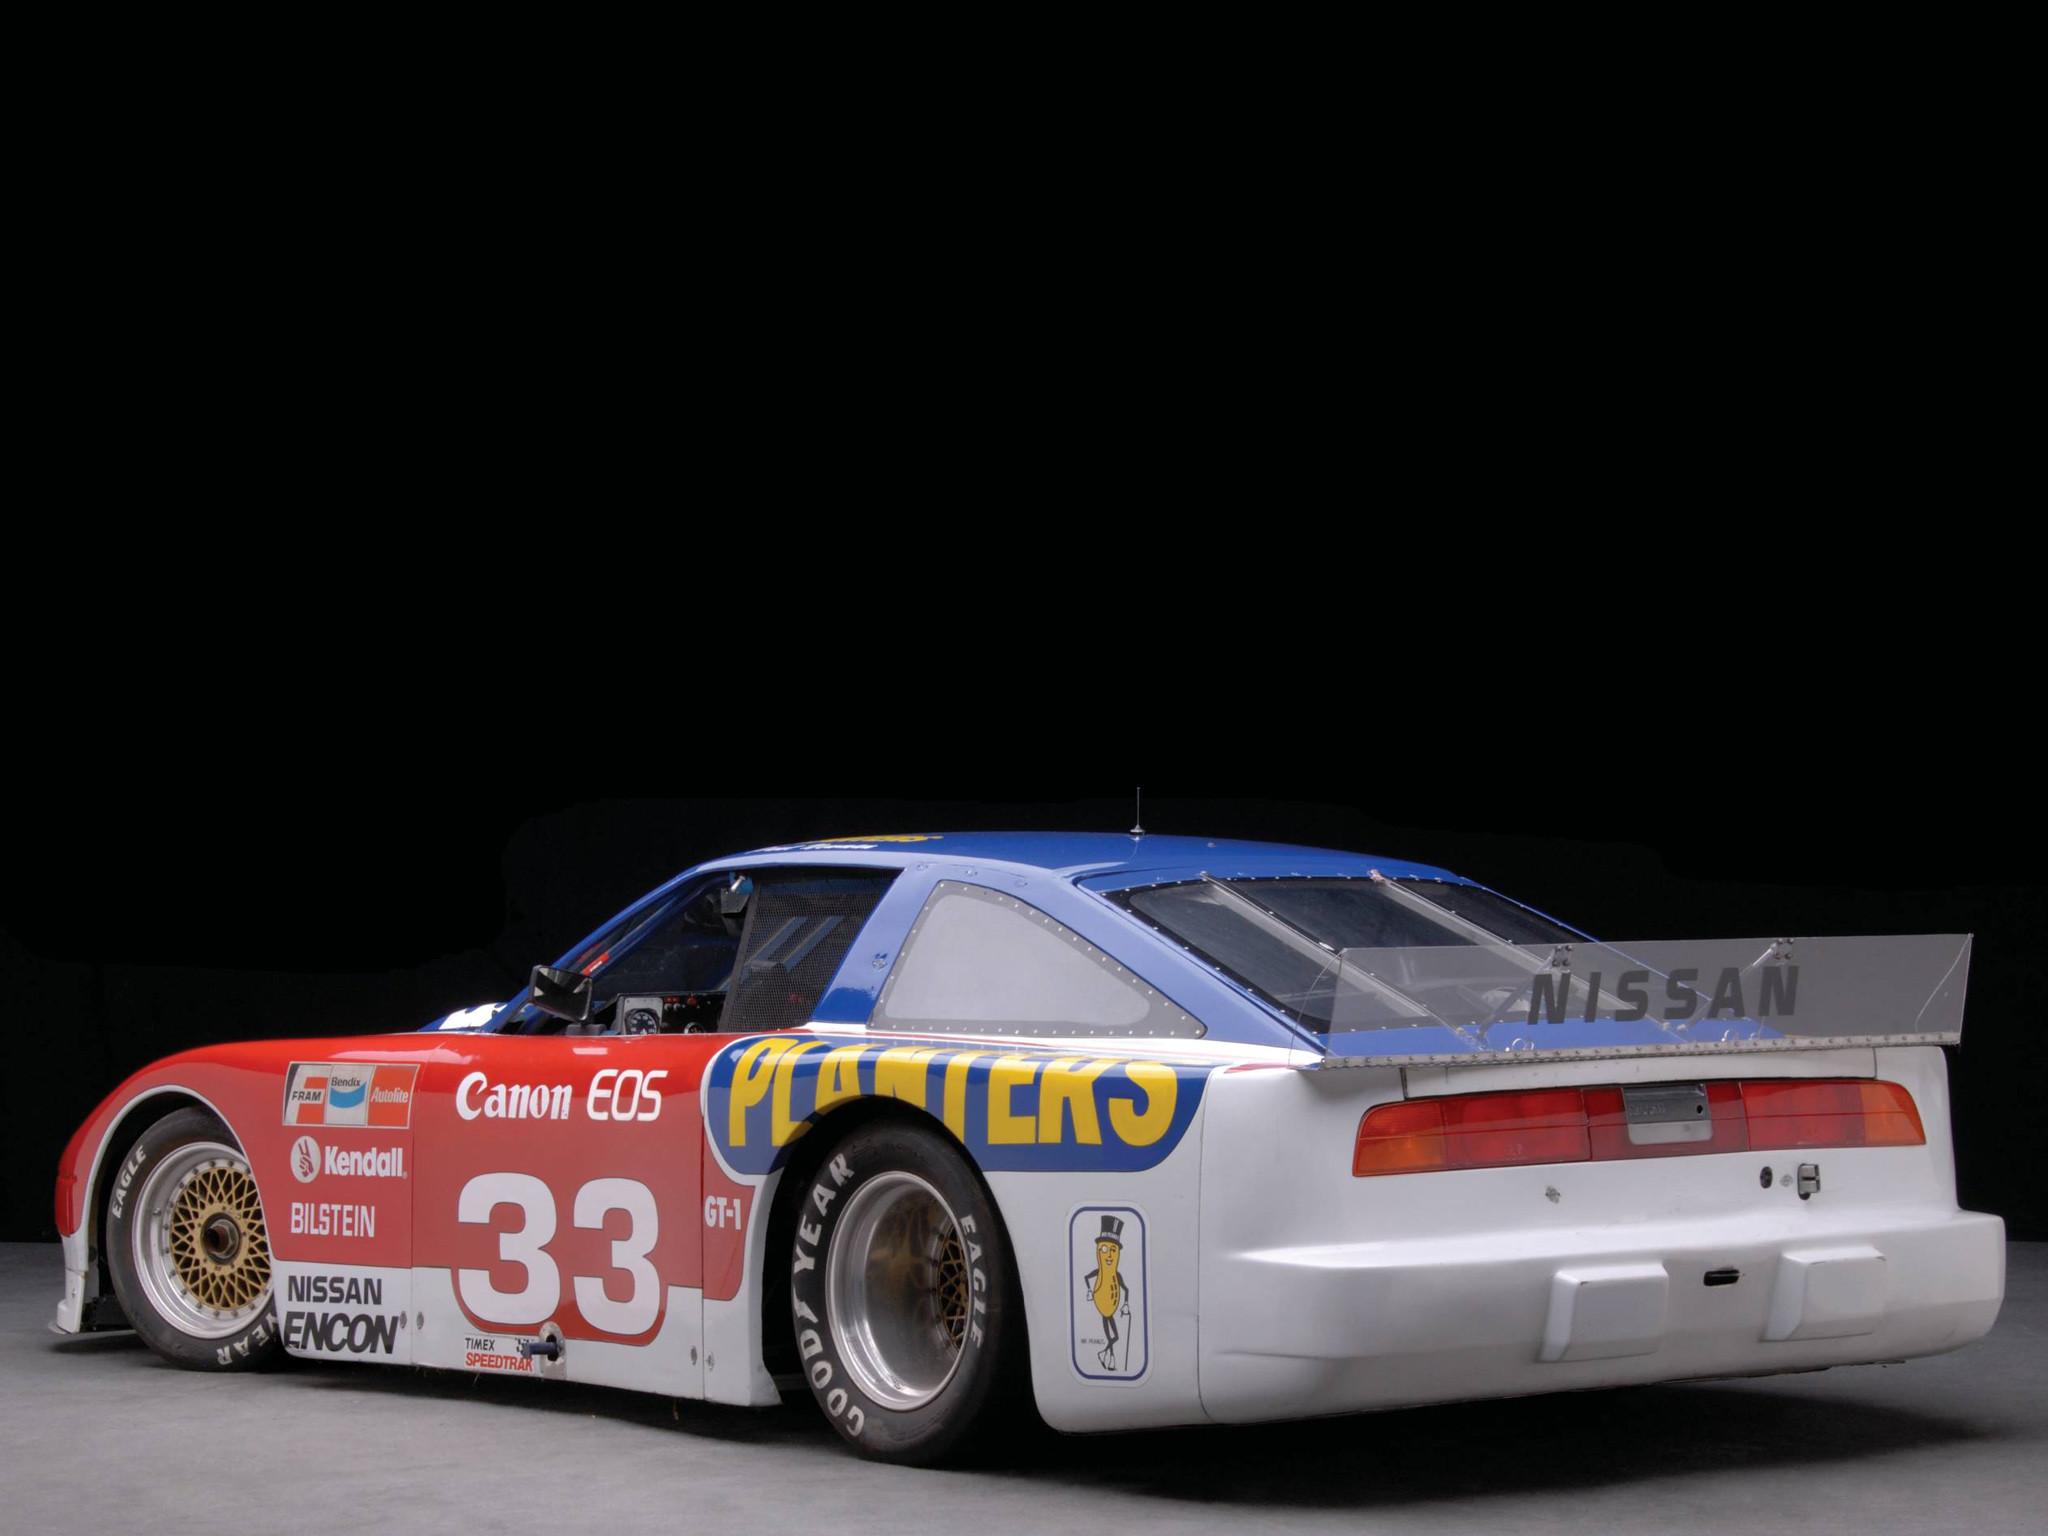 1986 Nissan 300ZX Turbo IMSA GTO Z31 racing race classic wallpaper |  | 117995 | WallpaperUP